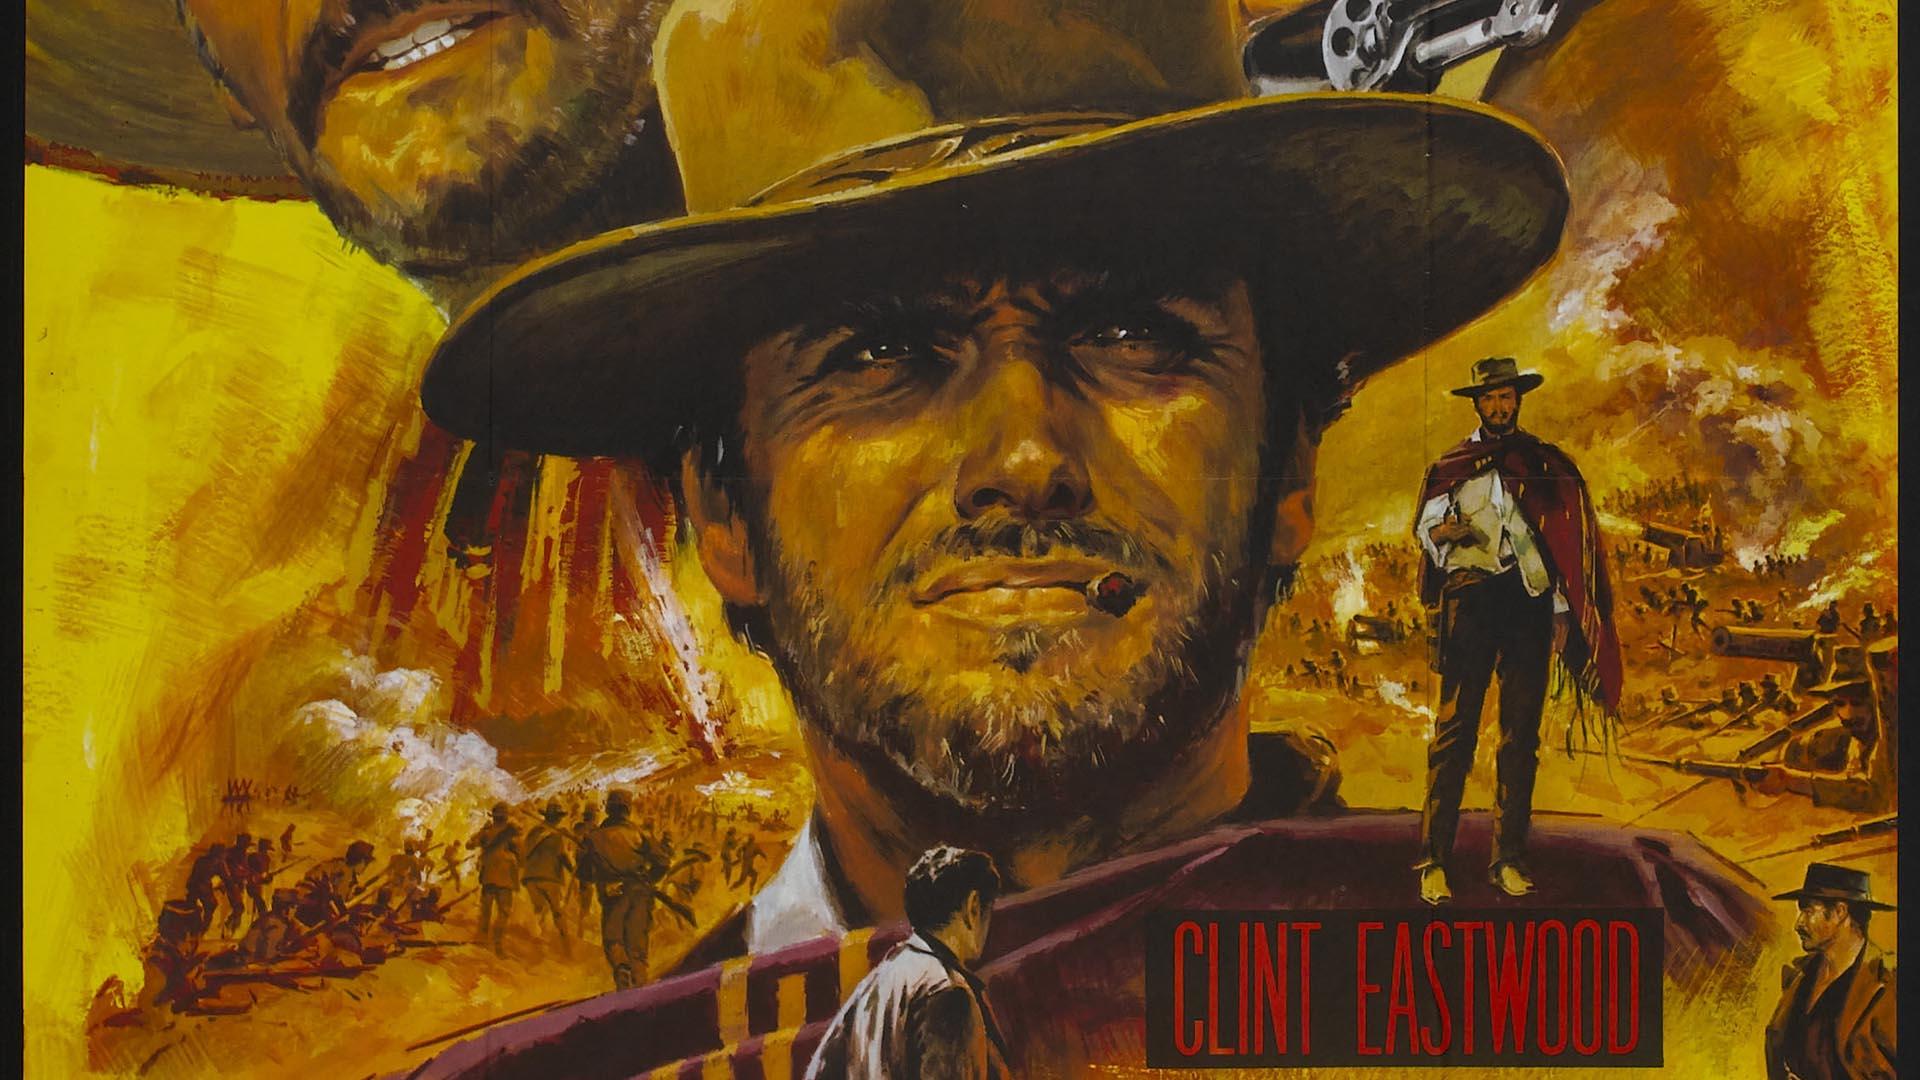 Classic movie background